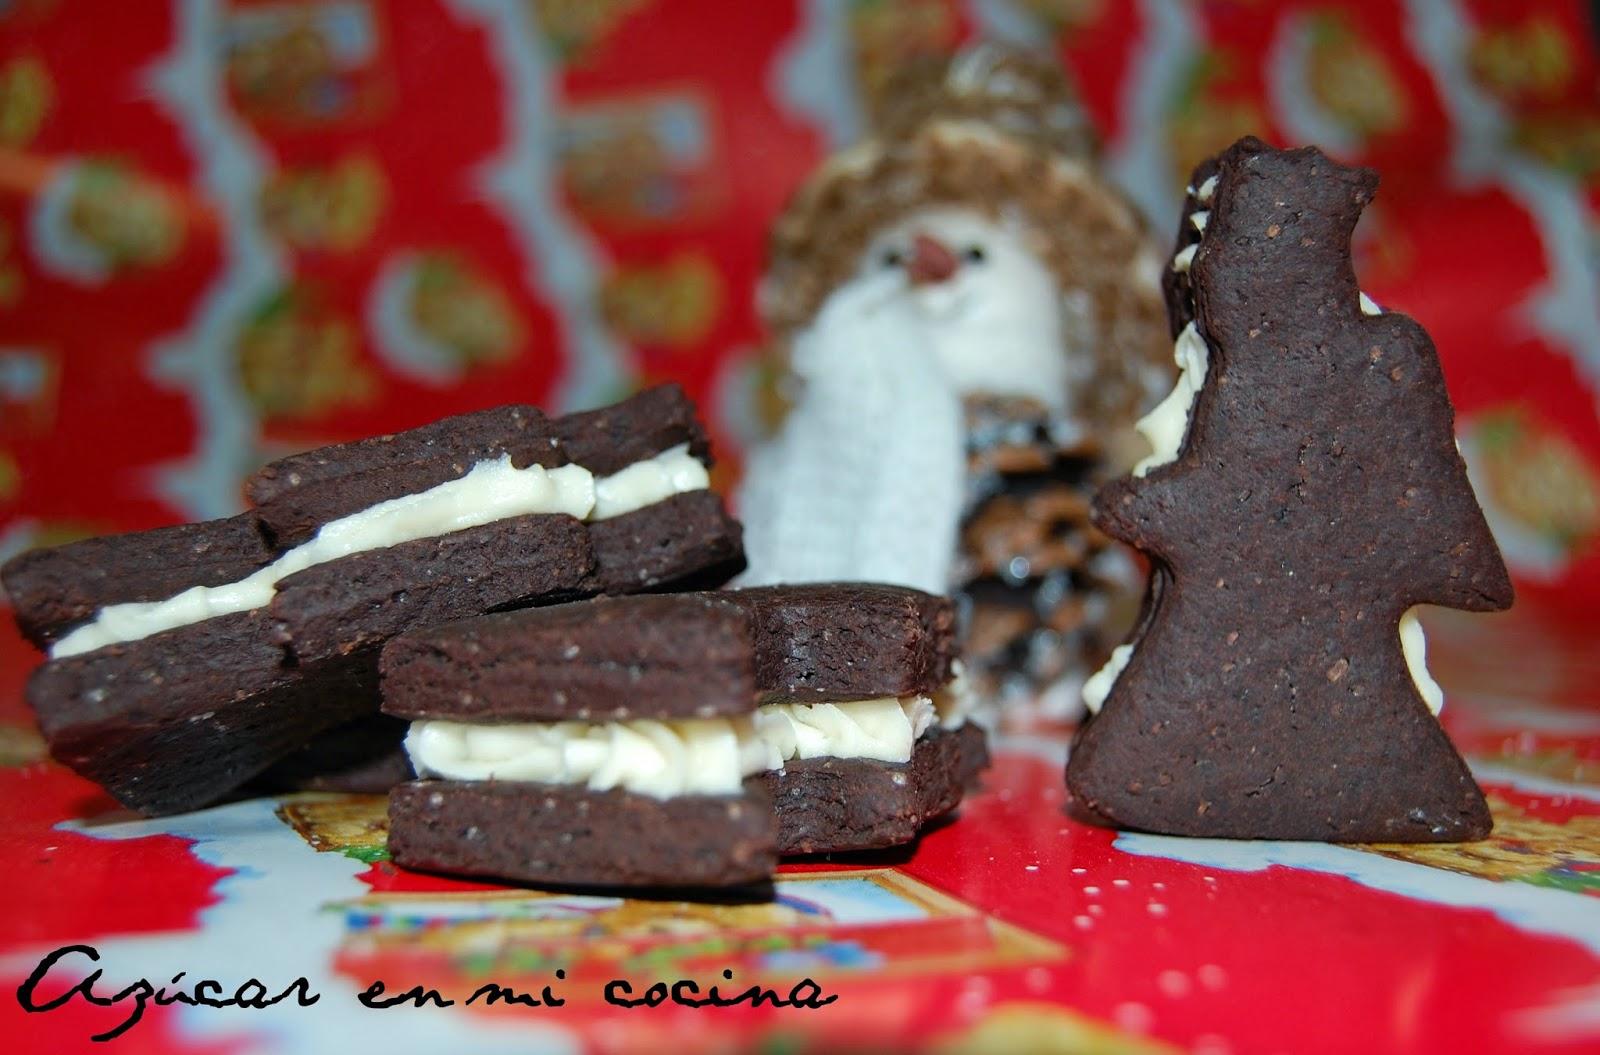 http://azucarenmicocina.blogspot.com.es/2013/12/galletas-oreo-navidenas-mi-asaltablog.html